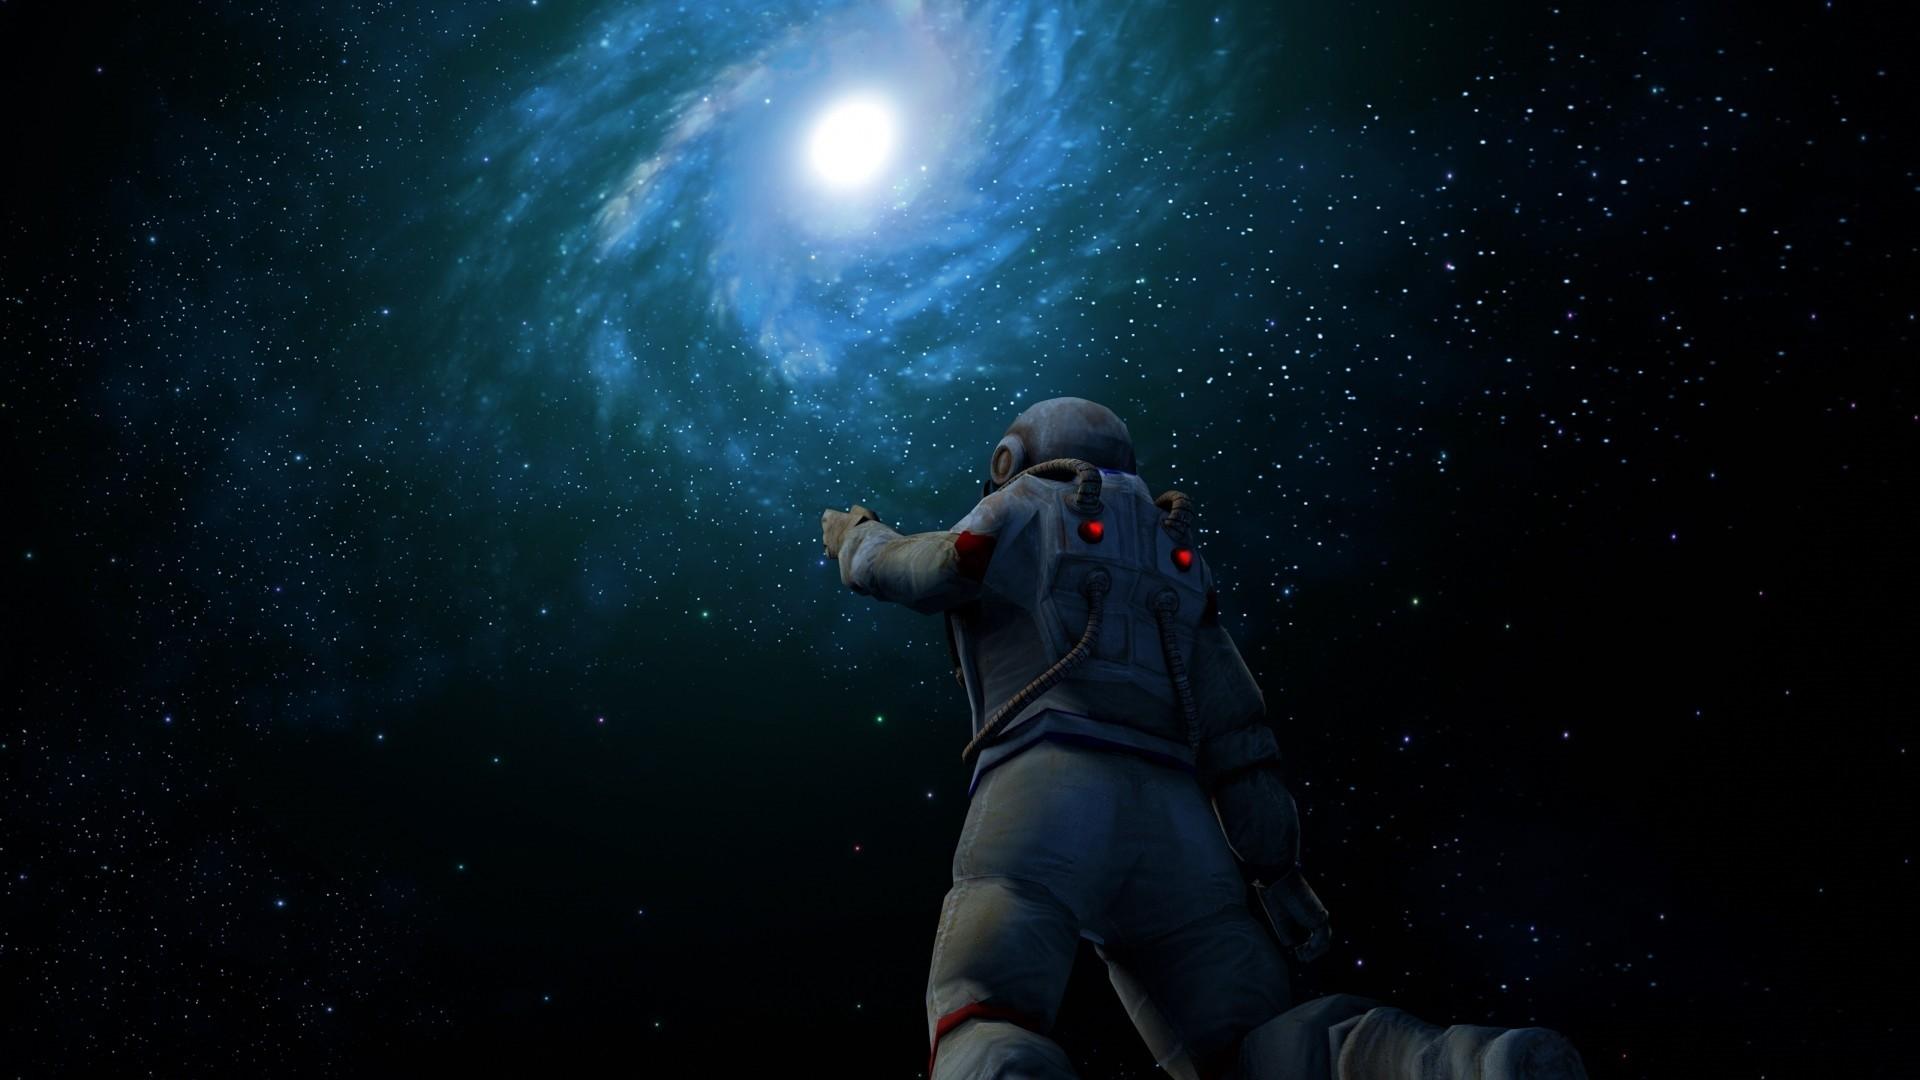 Astronaut Wallpaper image hd